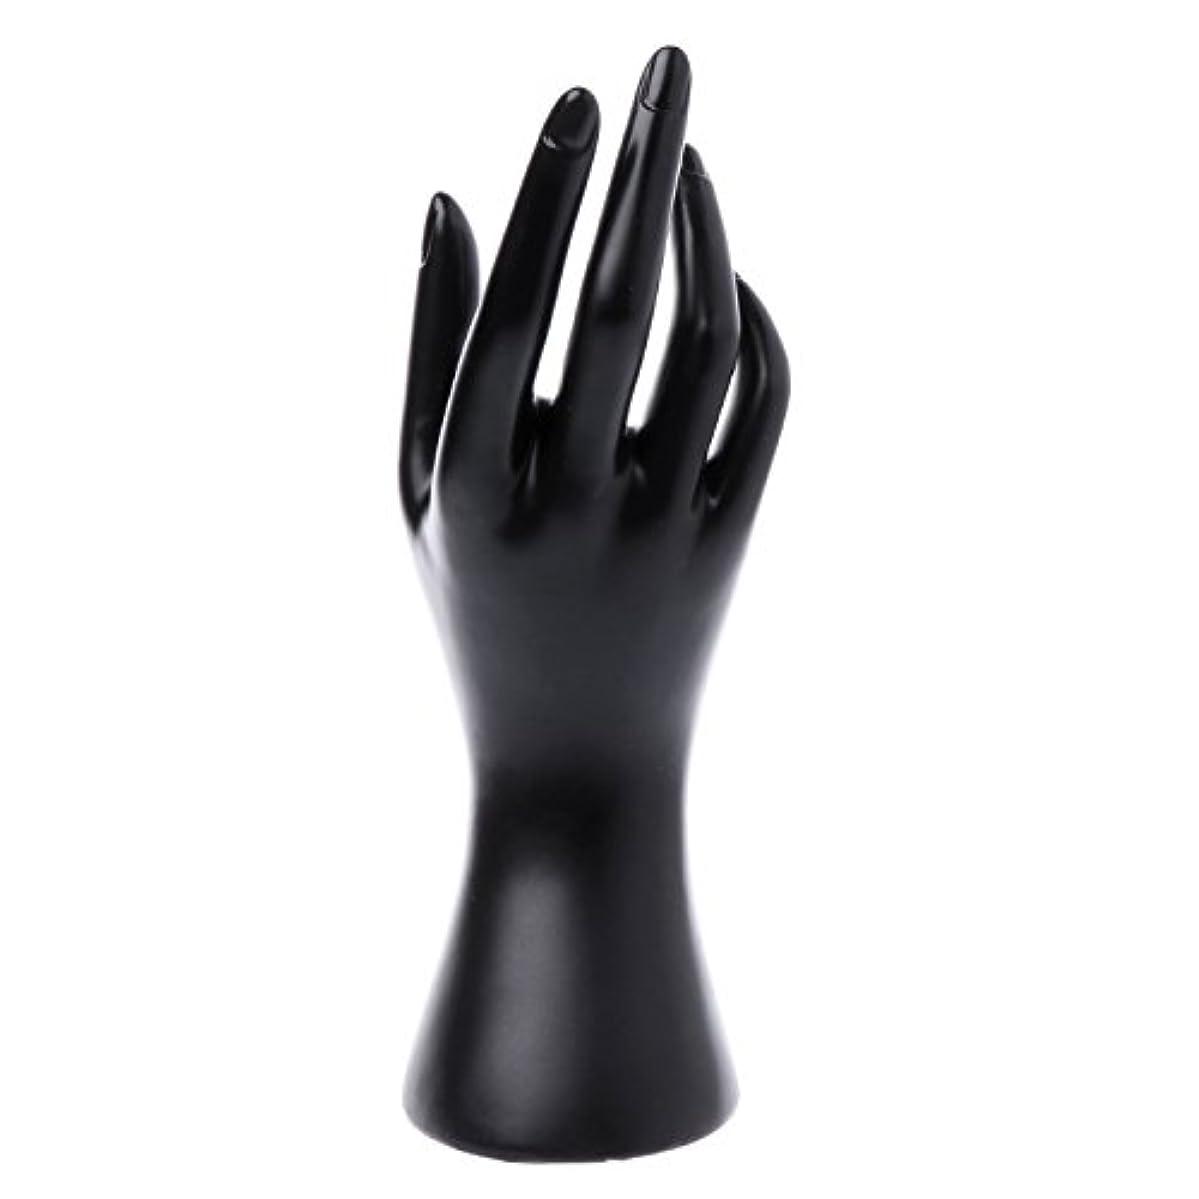 Maskdoo Mannequin Hand Finger Glove,Ring, Bracelet, Bangle, Jewelry Display Stand Organizer Holder (Black)